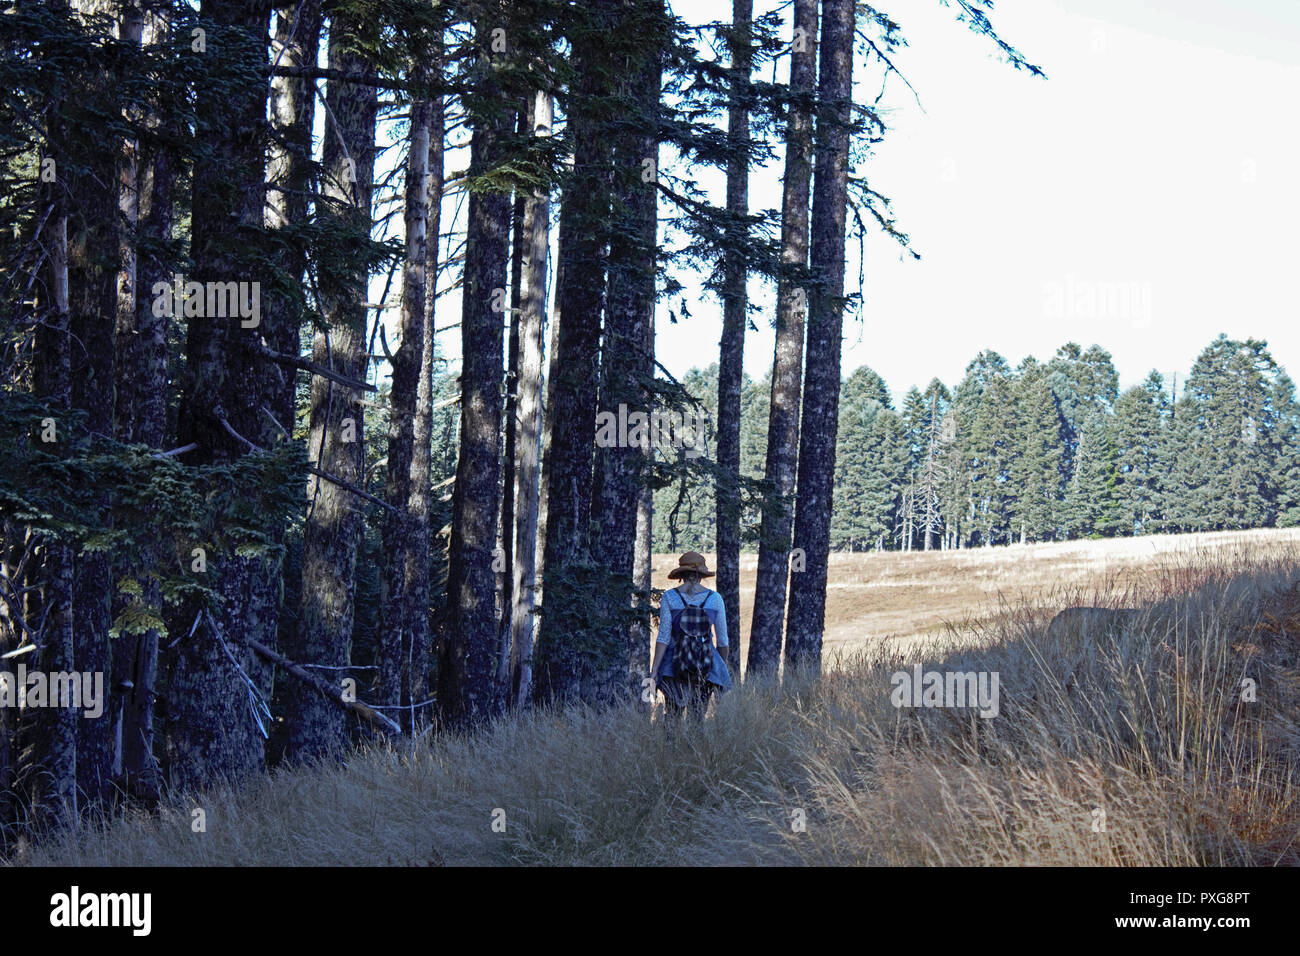 A lone hiker skirts the treeline along a high meadow trail. - Stock Image